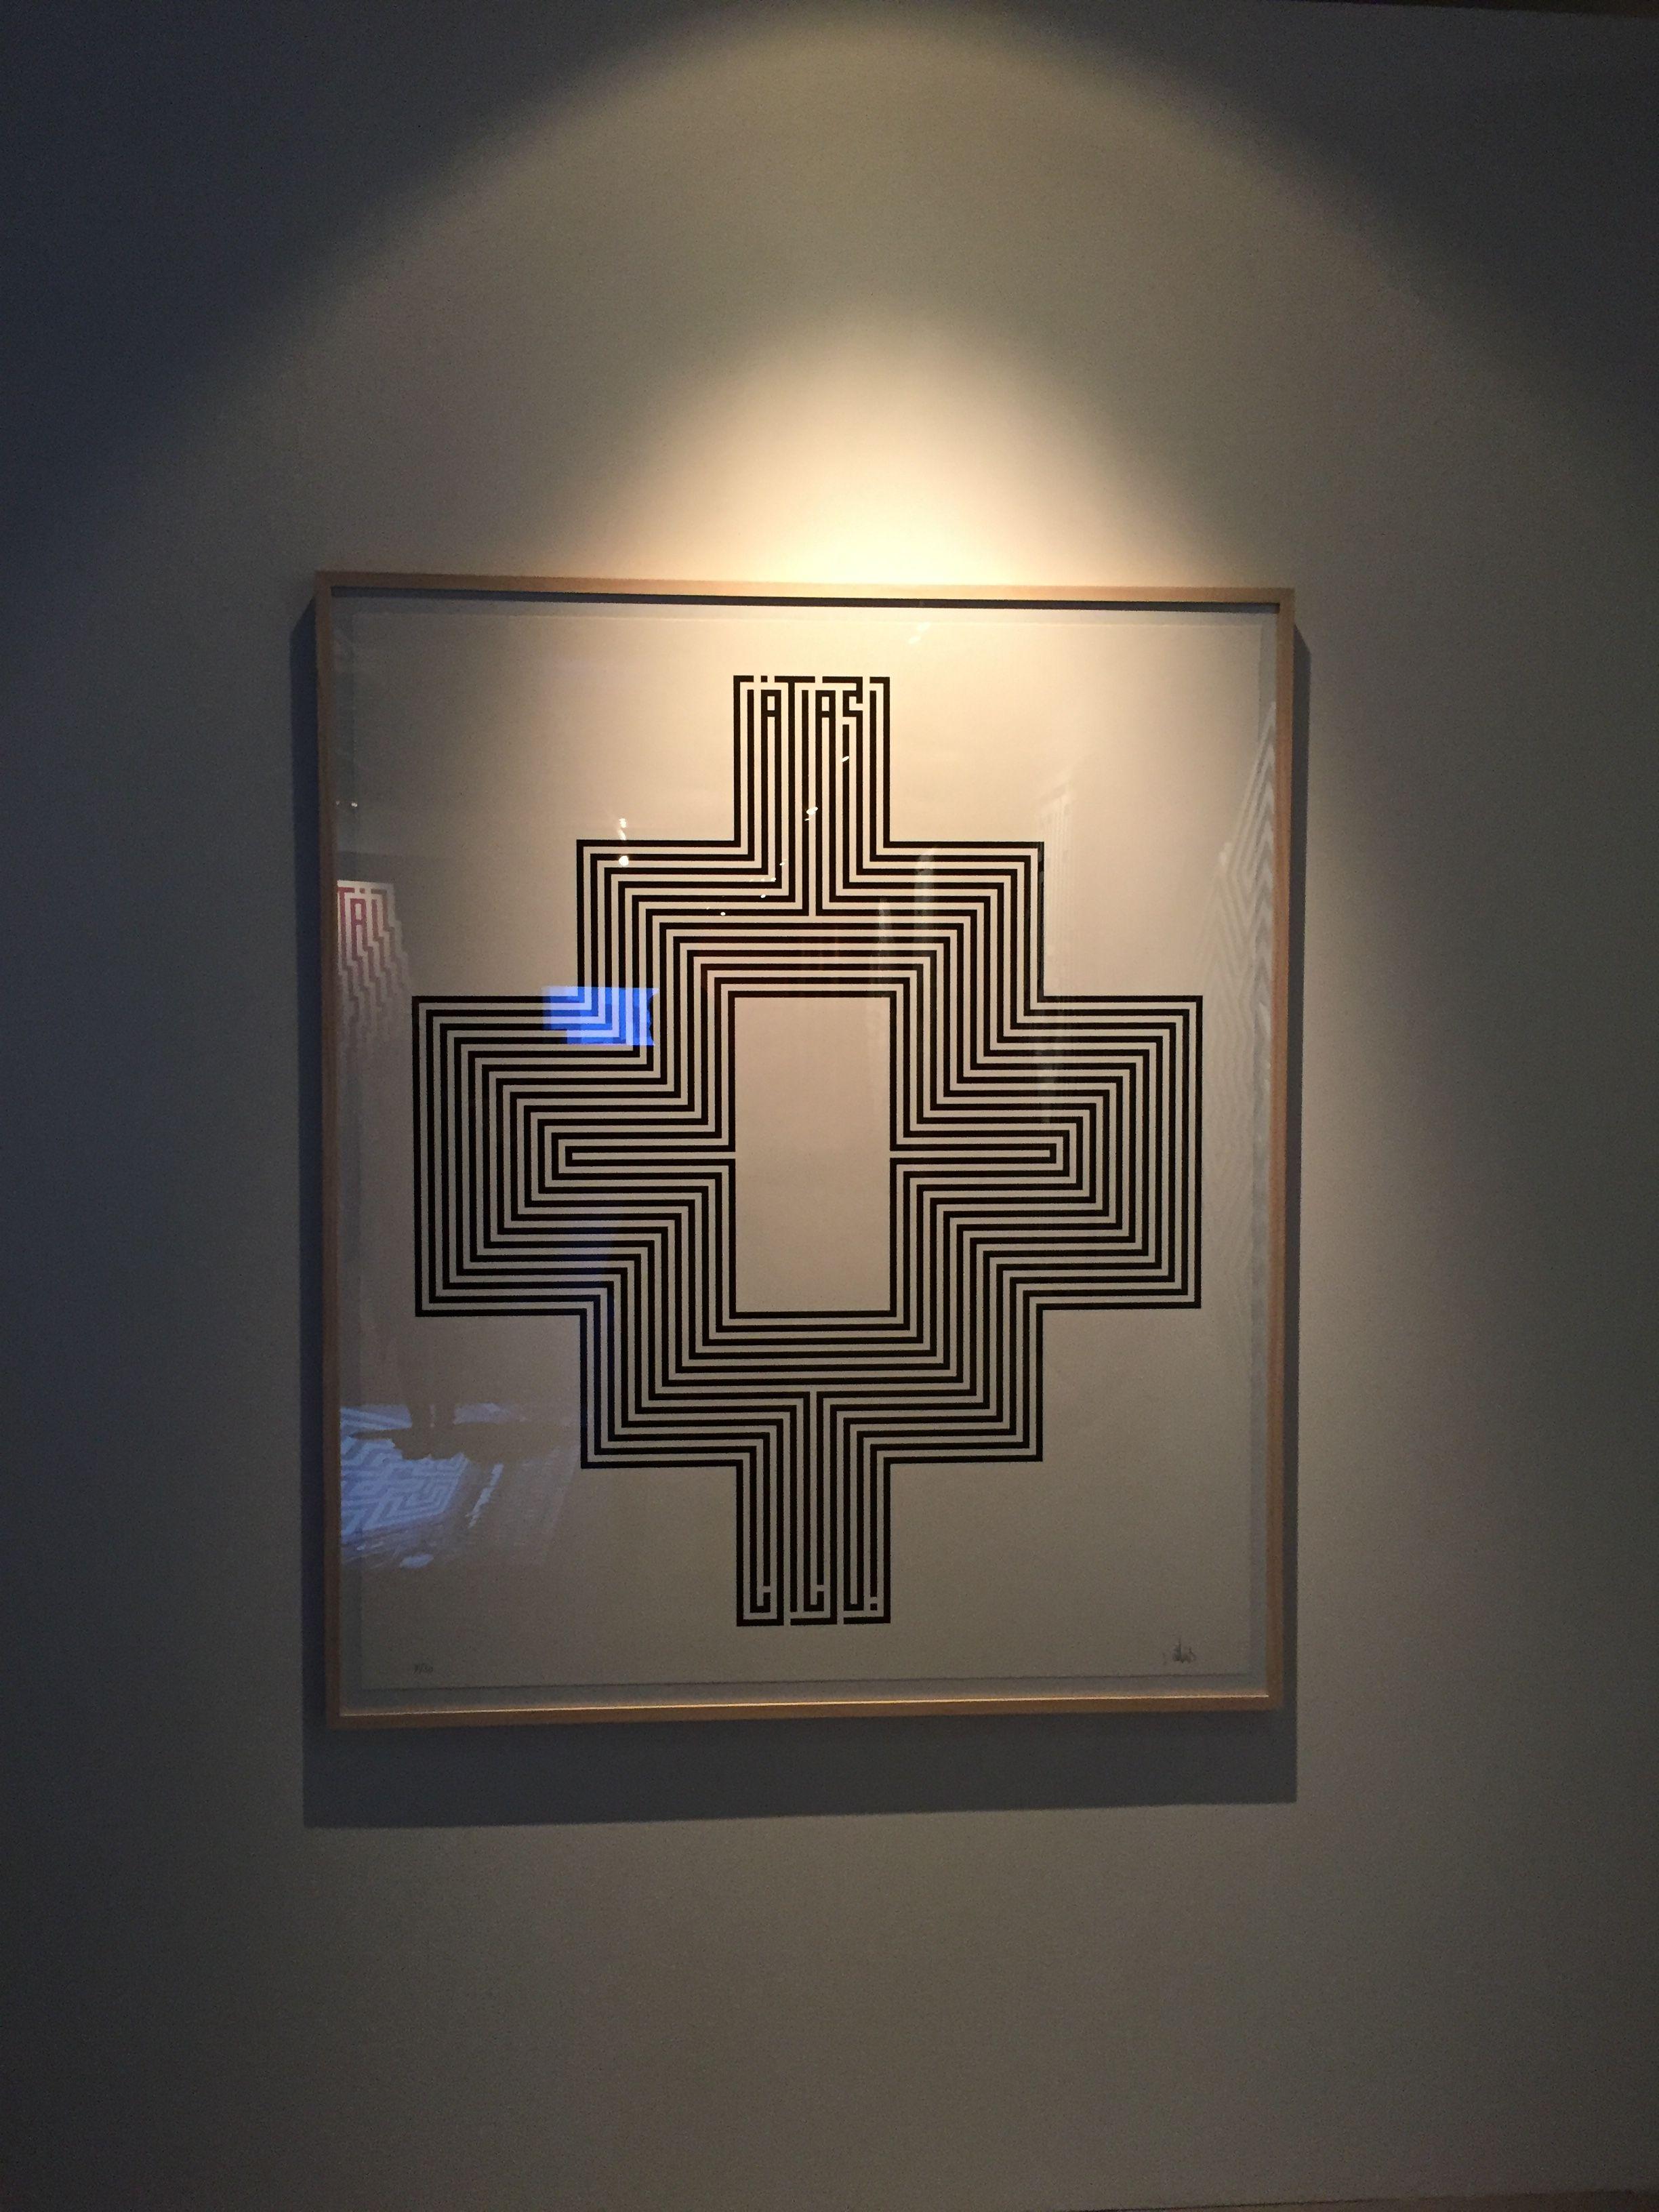 Pin By Jult On Amazing Maze